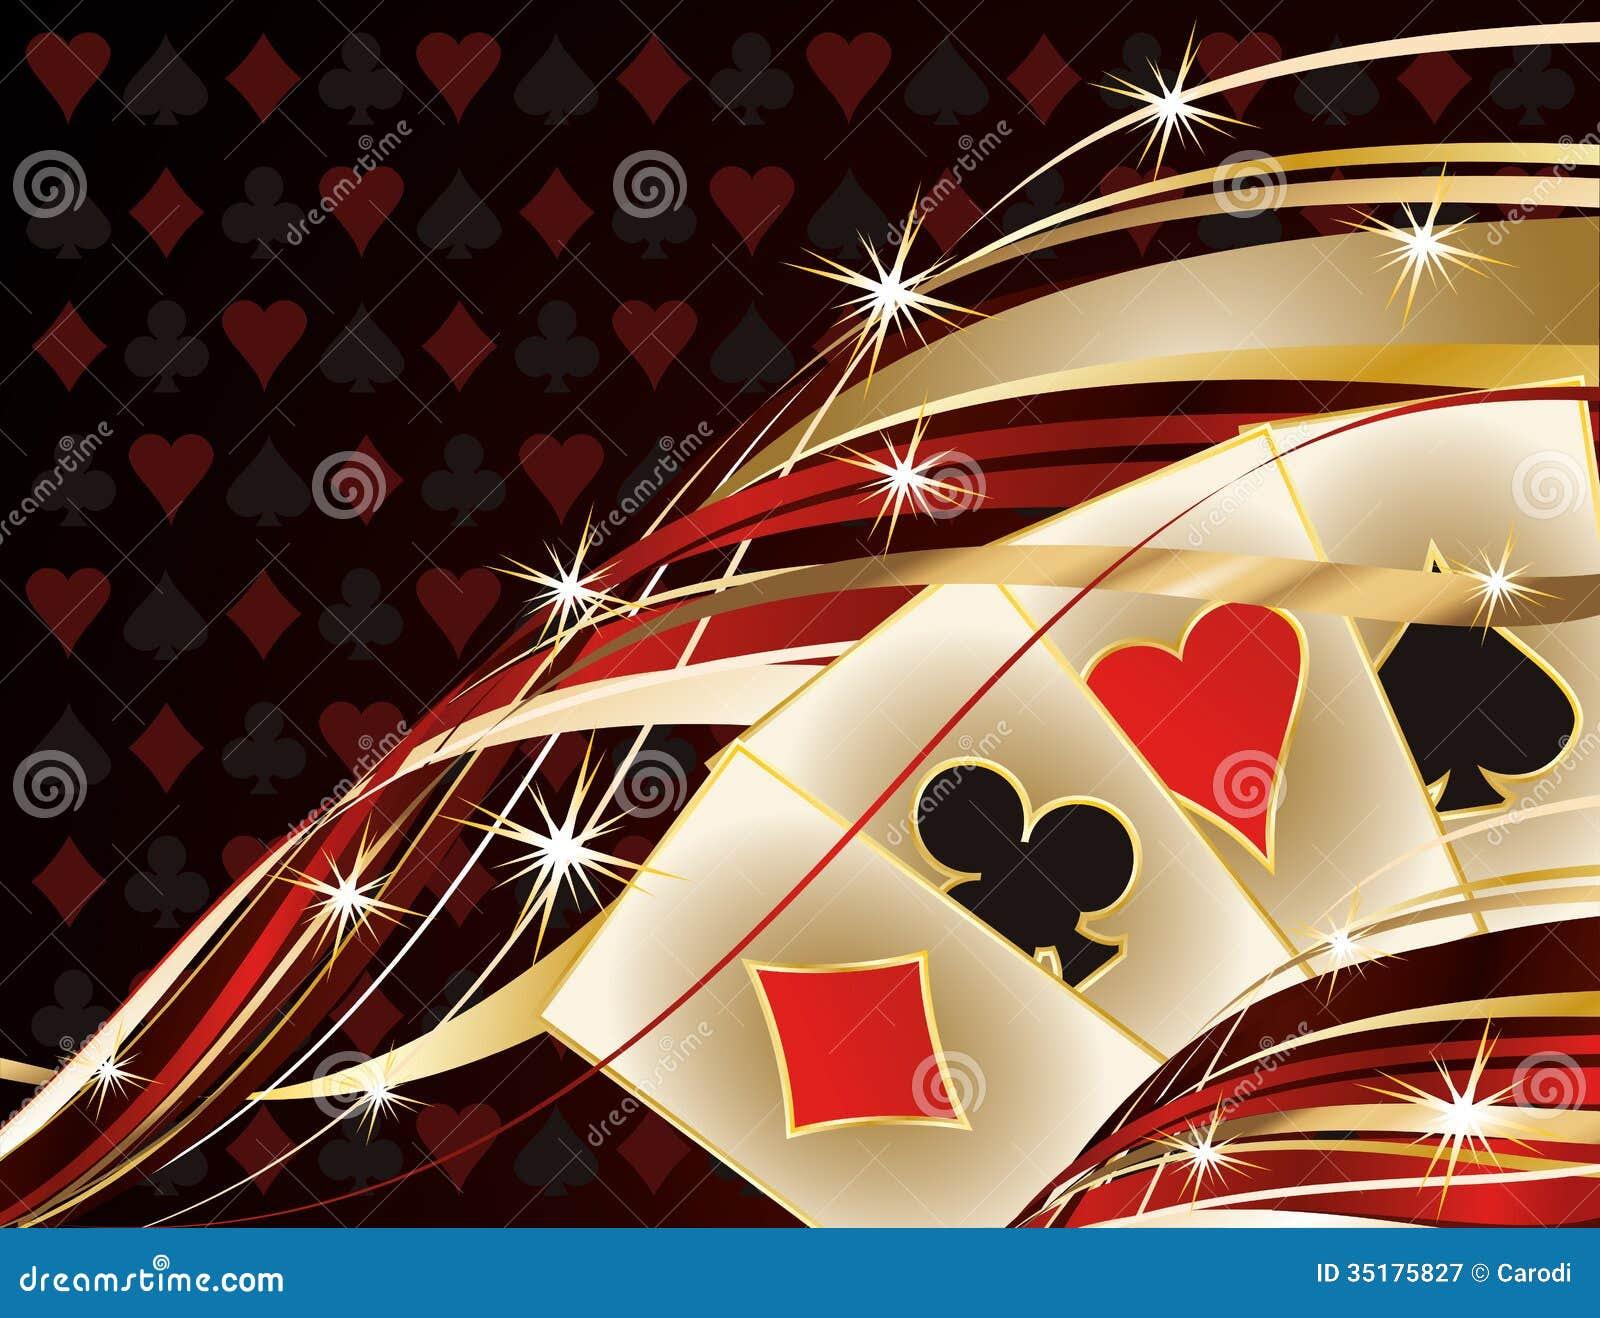 Gambling Banners - CafePress